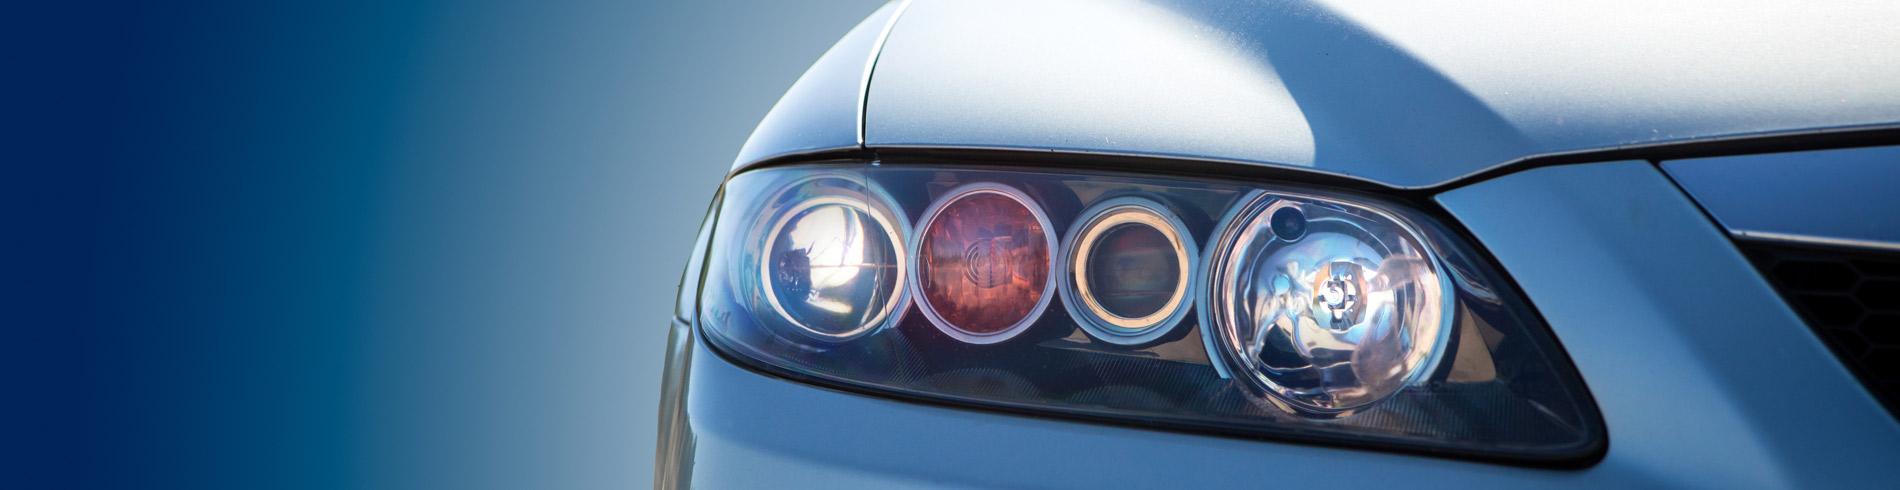 Assegurança-vehicles-empresa